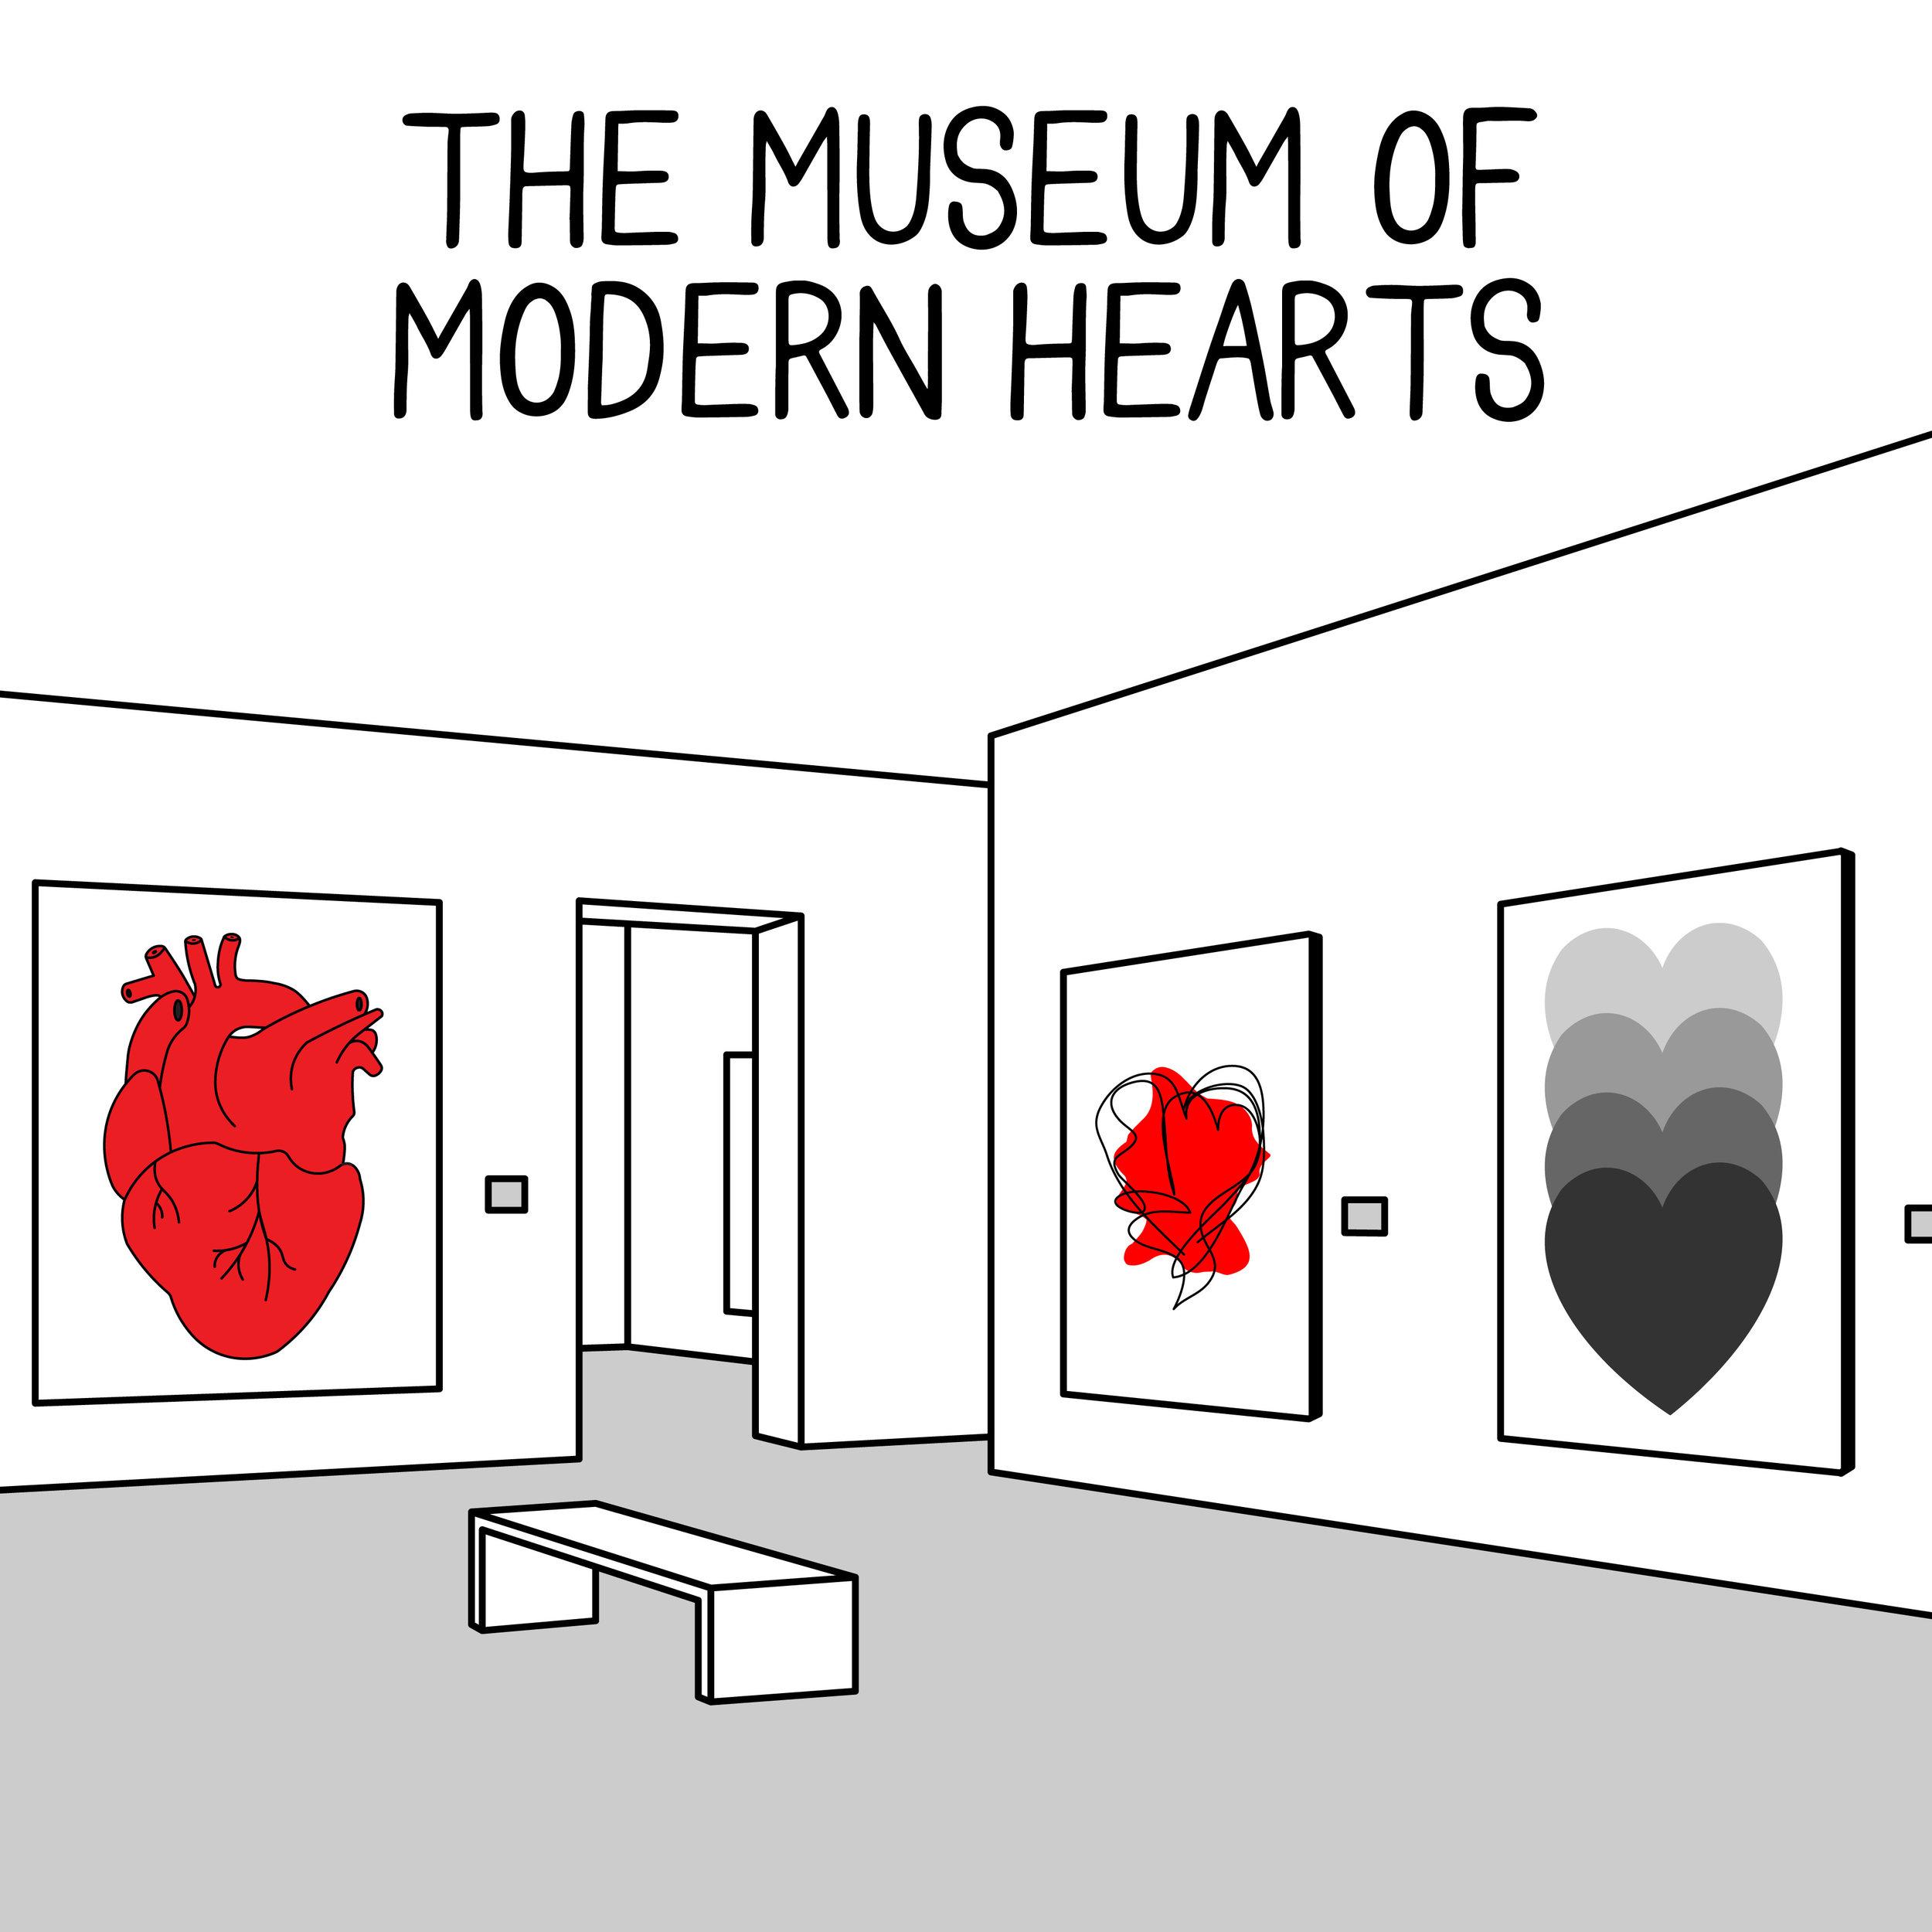 MUSEUMOFmodernHEARTS-01.jpg